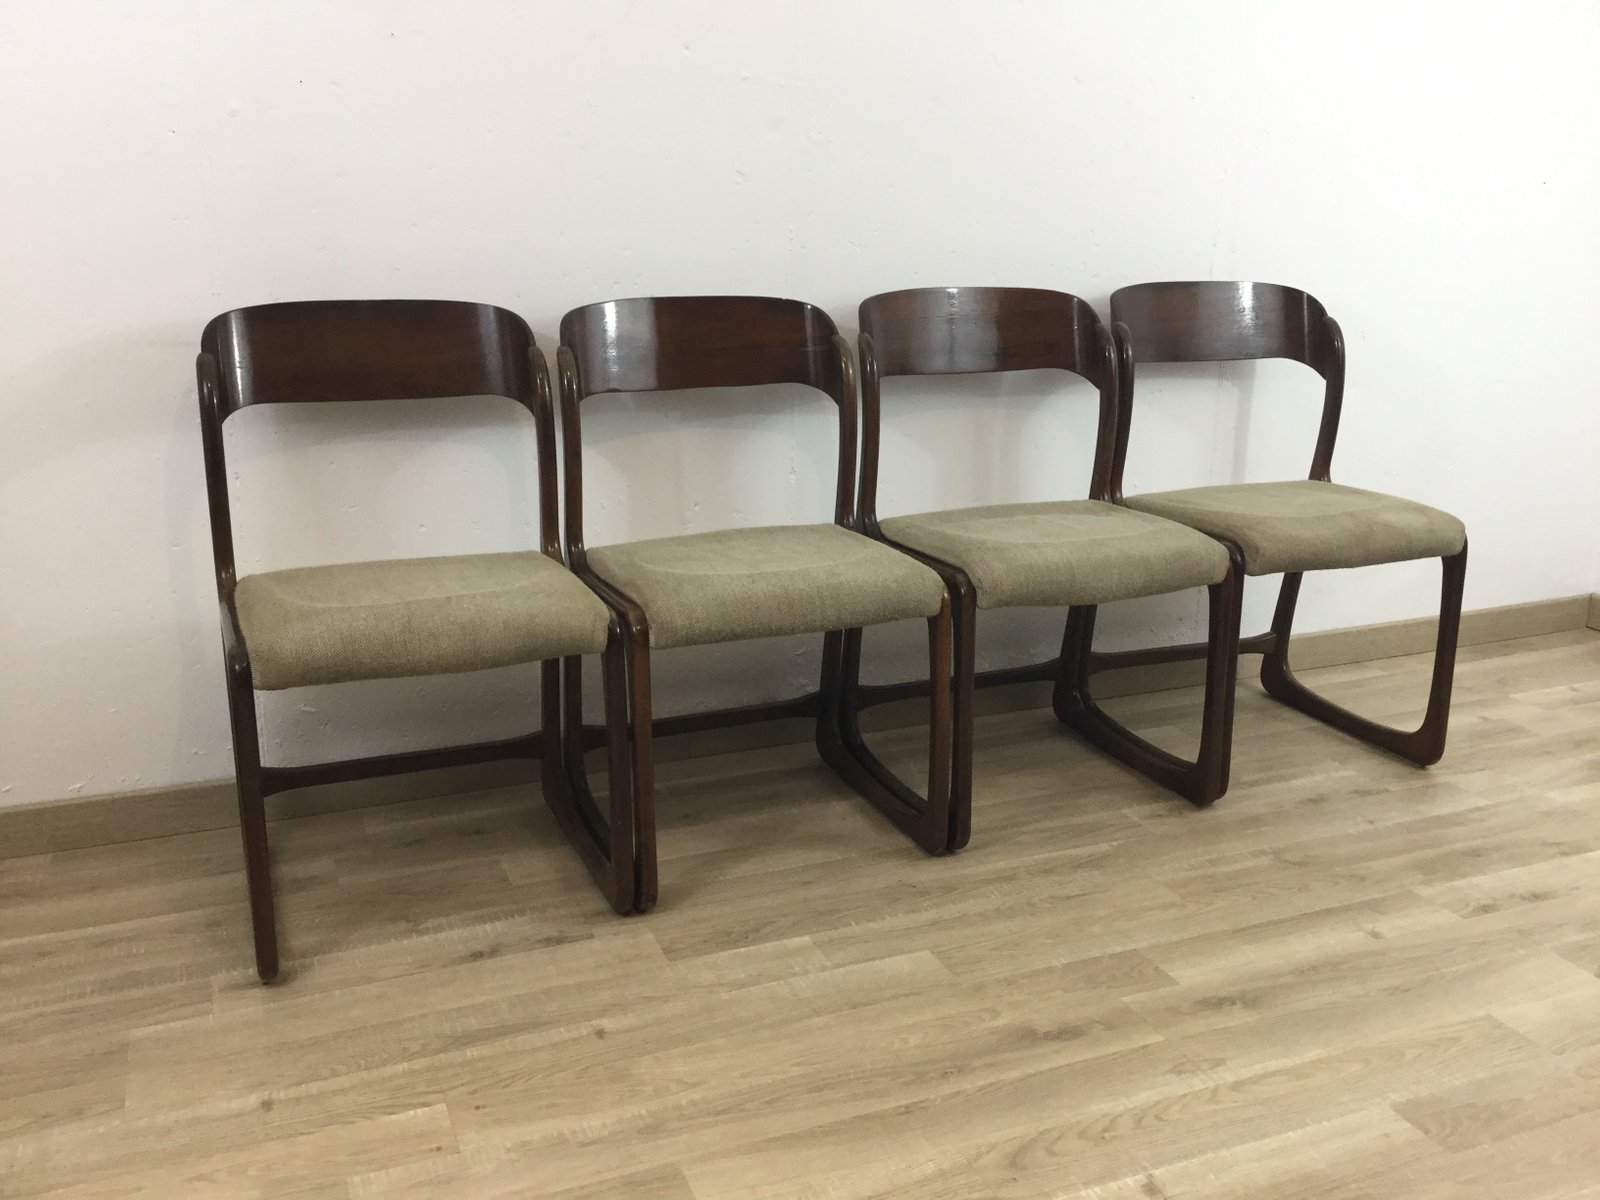 sled st hle von baumann 1960er 4er set bei pamono kaufen. Black Bedroom Furniture Sets. Home Design Ideas